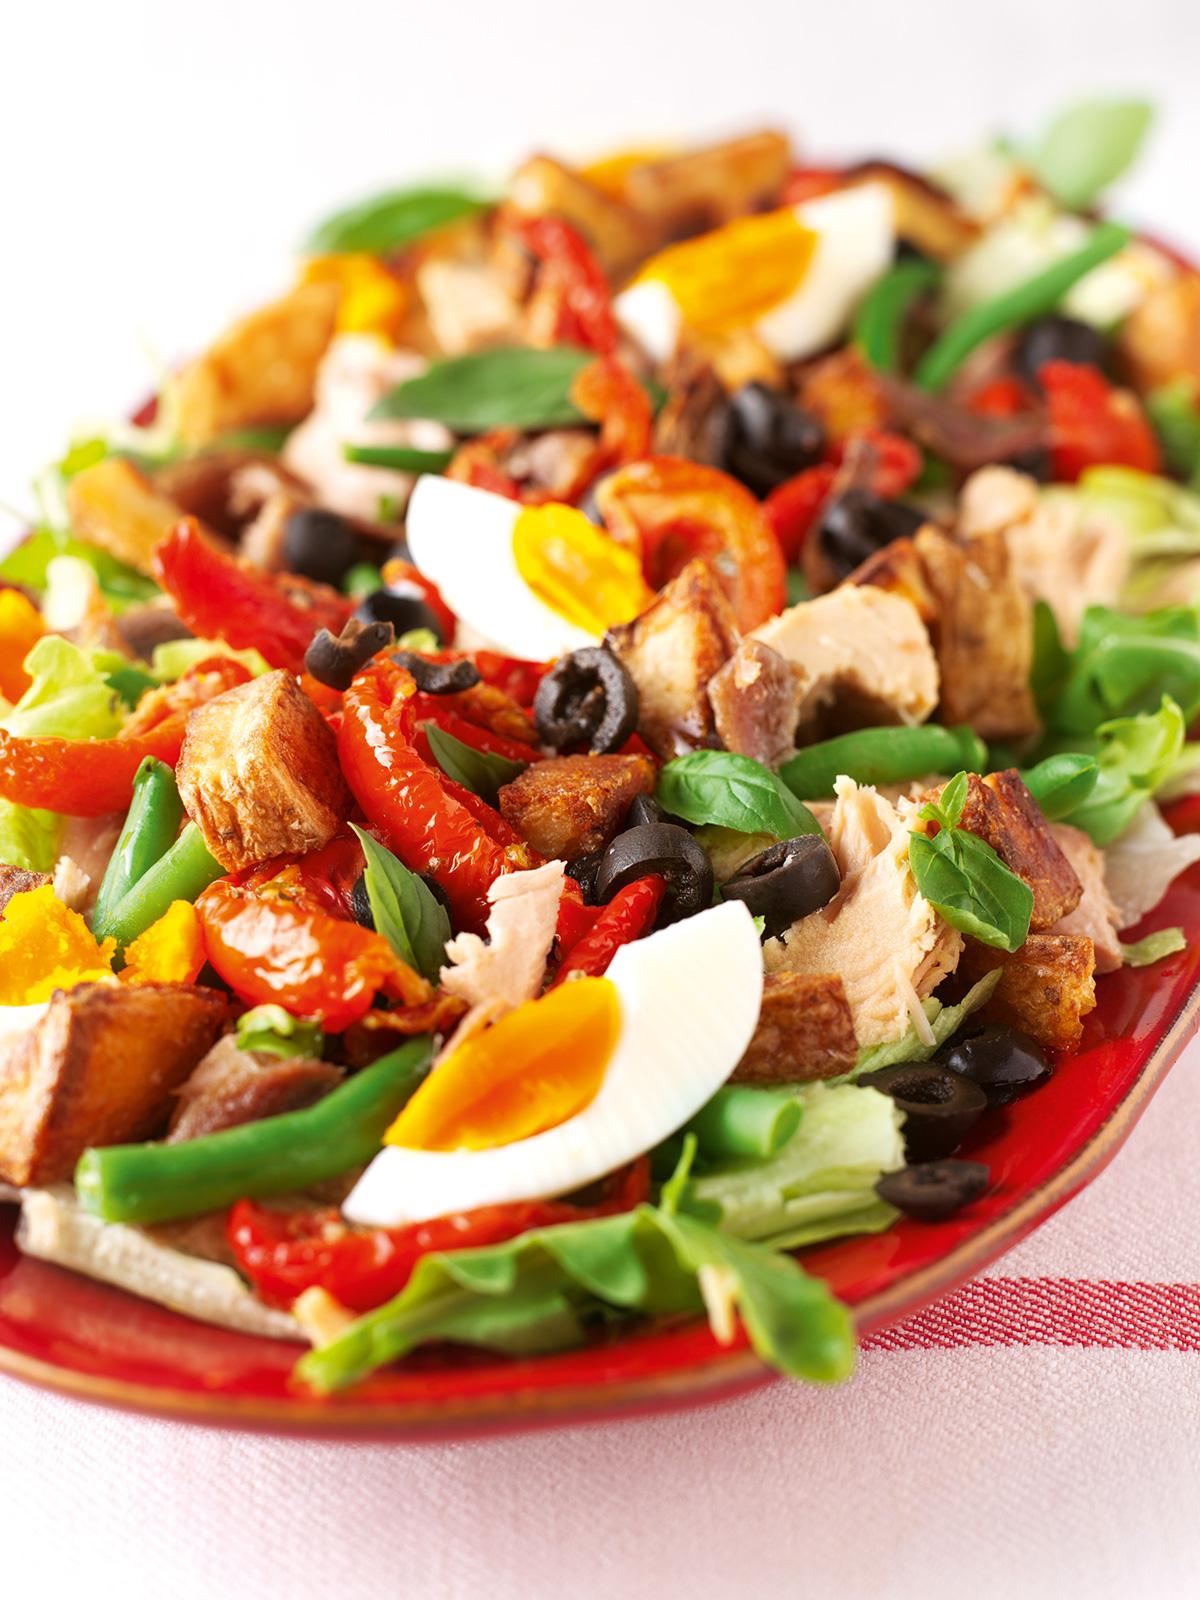 Salade nicoise uk